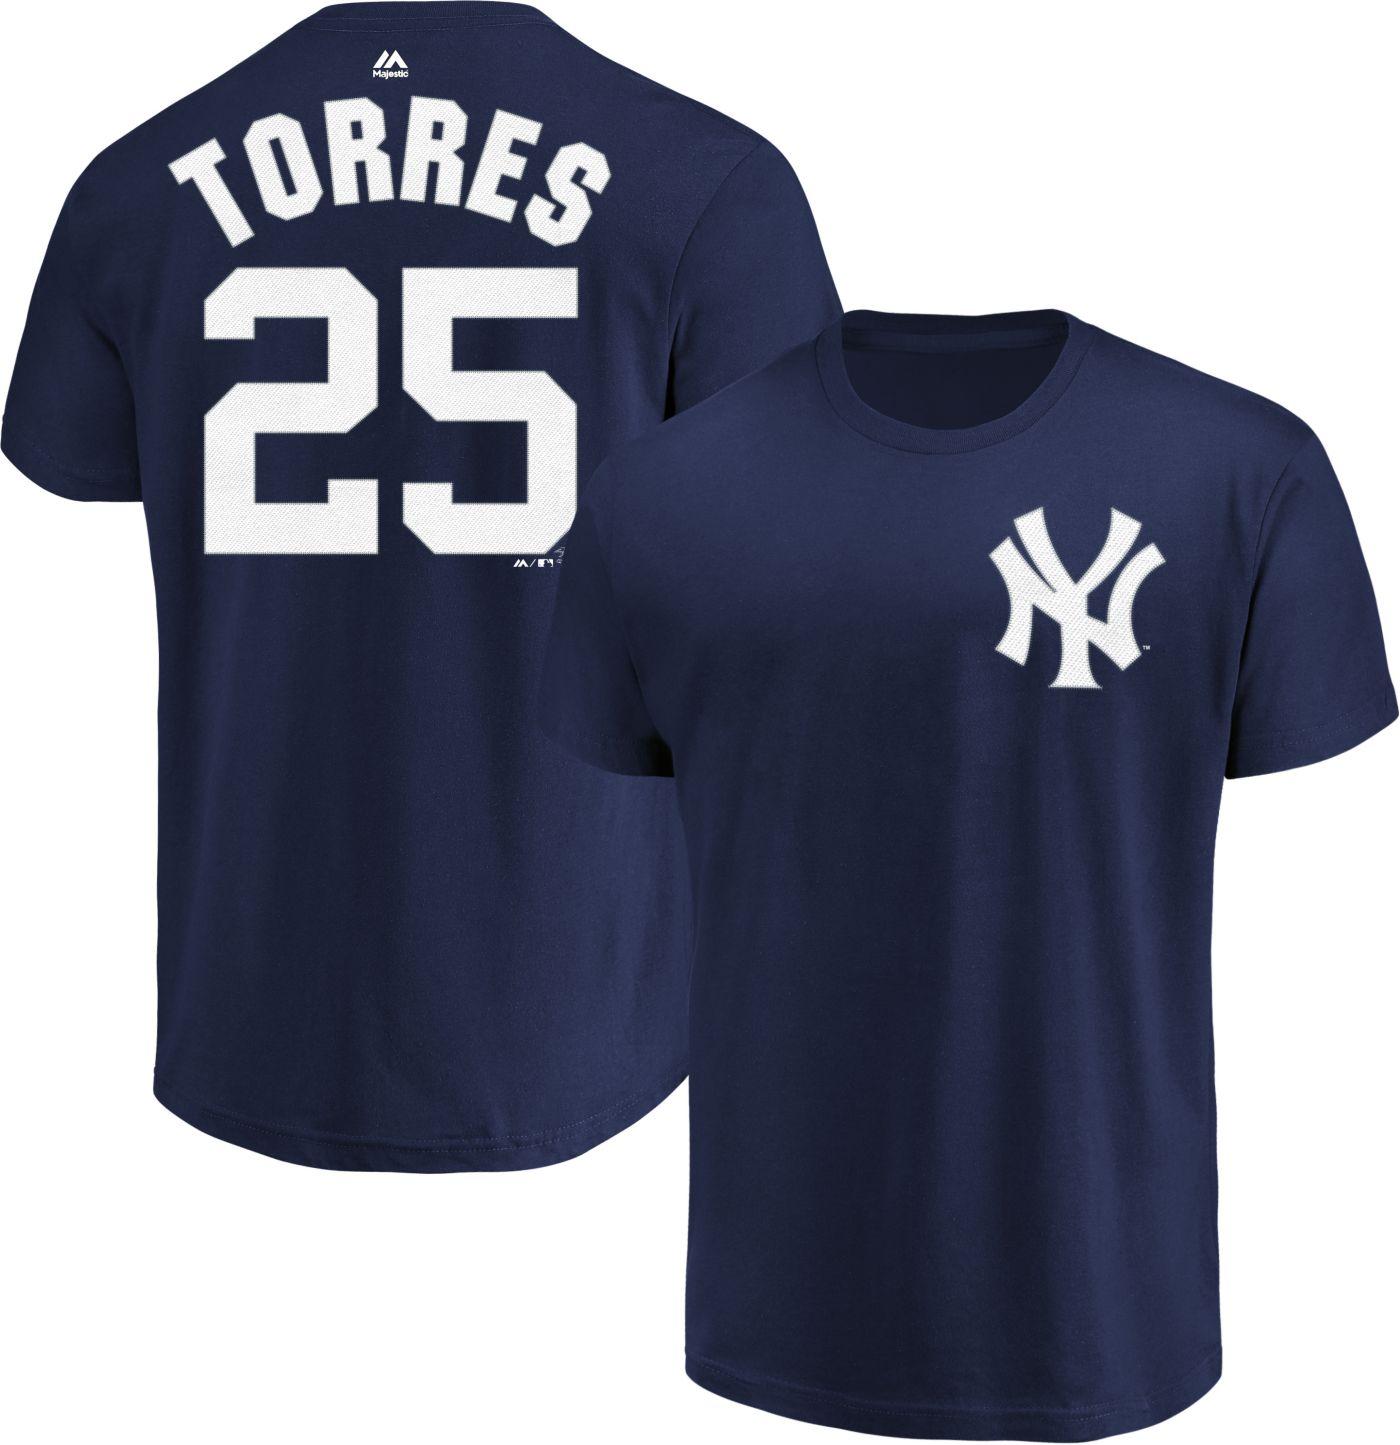 Majestic Youth New York Yankees Gleyber Torres #25 Navy T-Shirt